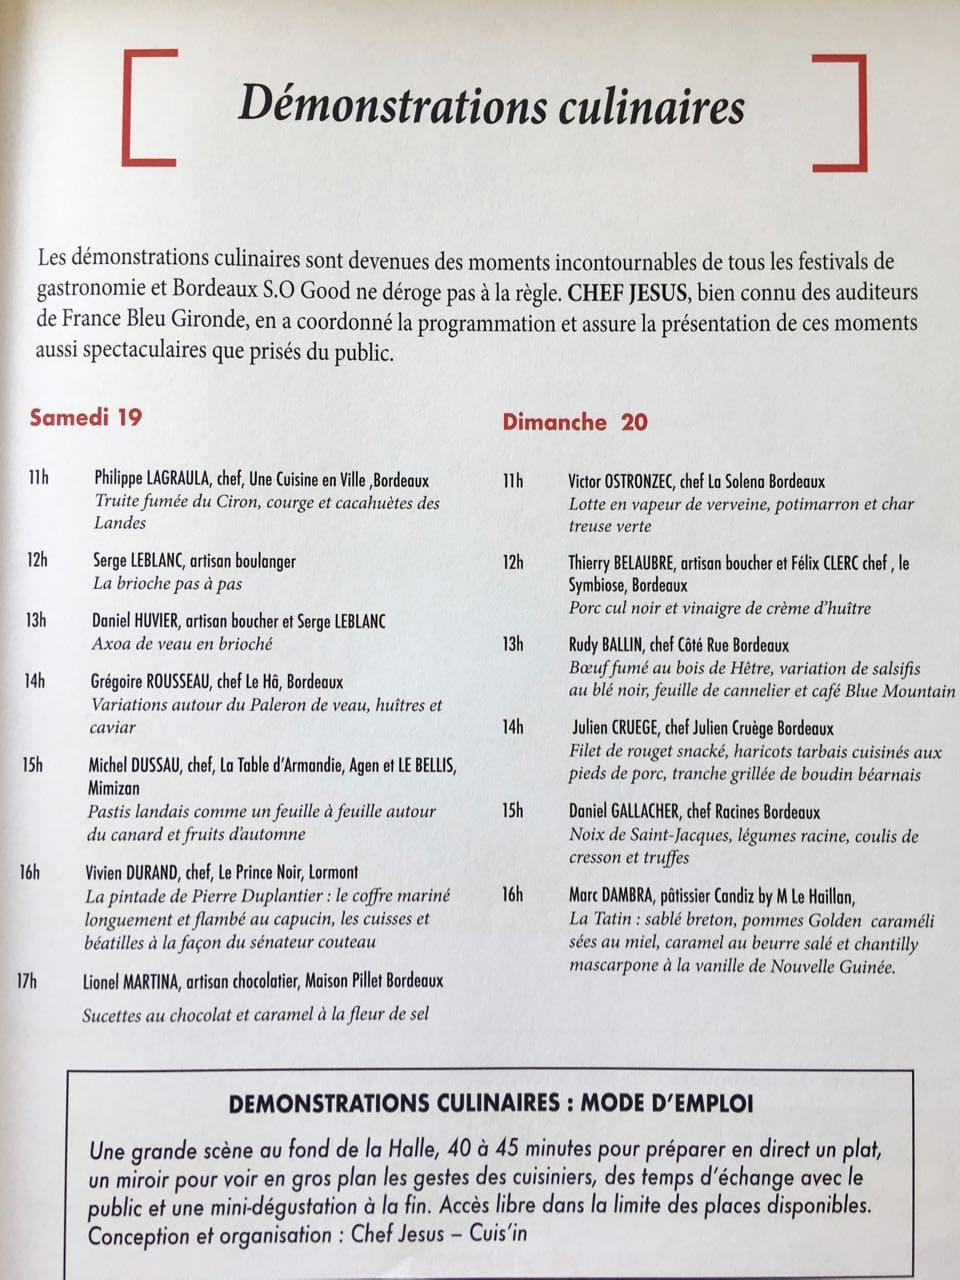 Programme Bordeaux S.o Good Démonstrations culinaires